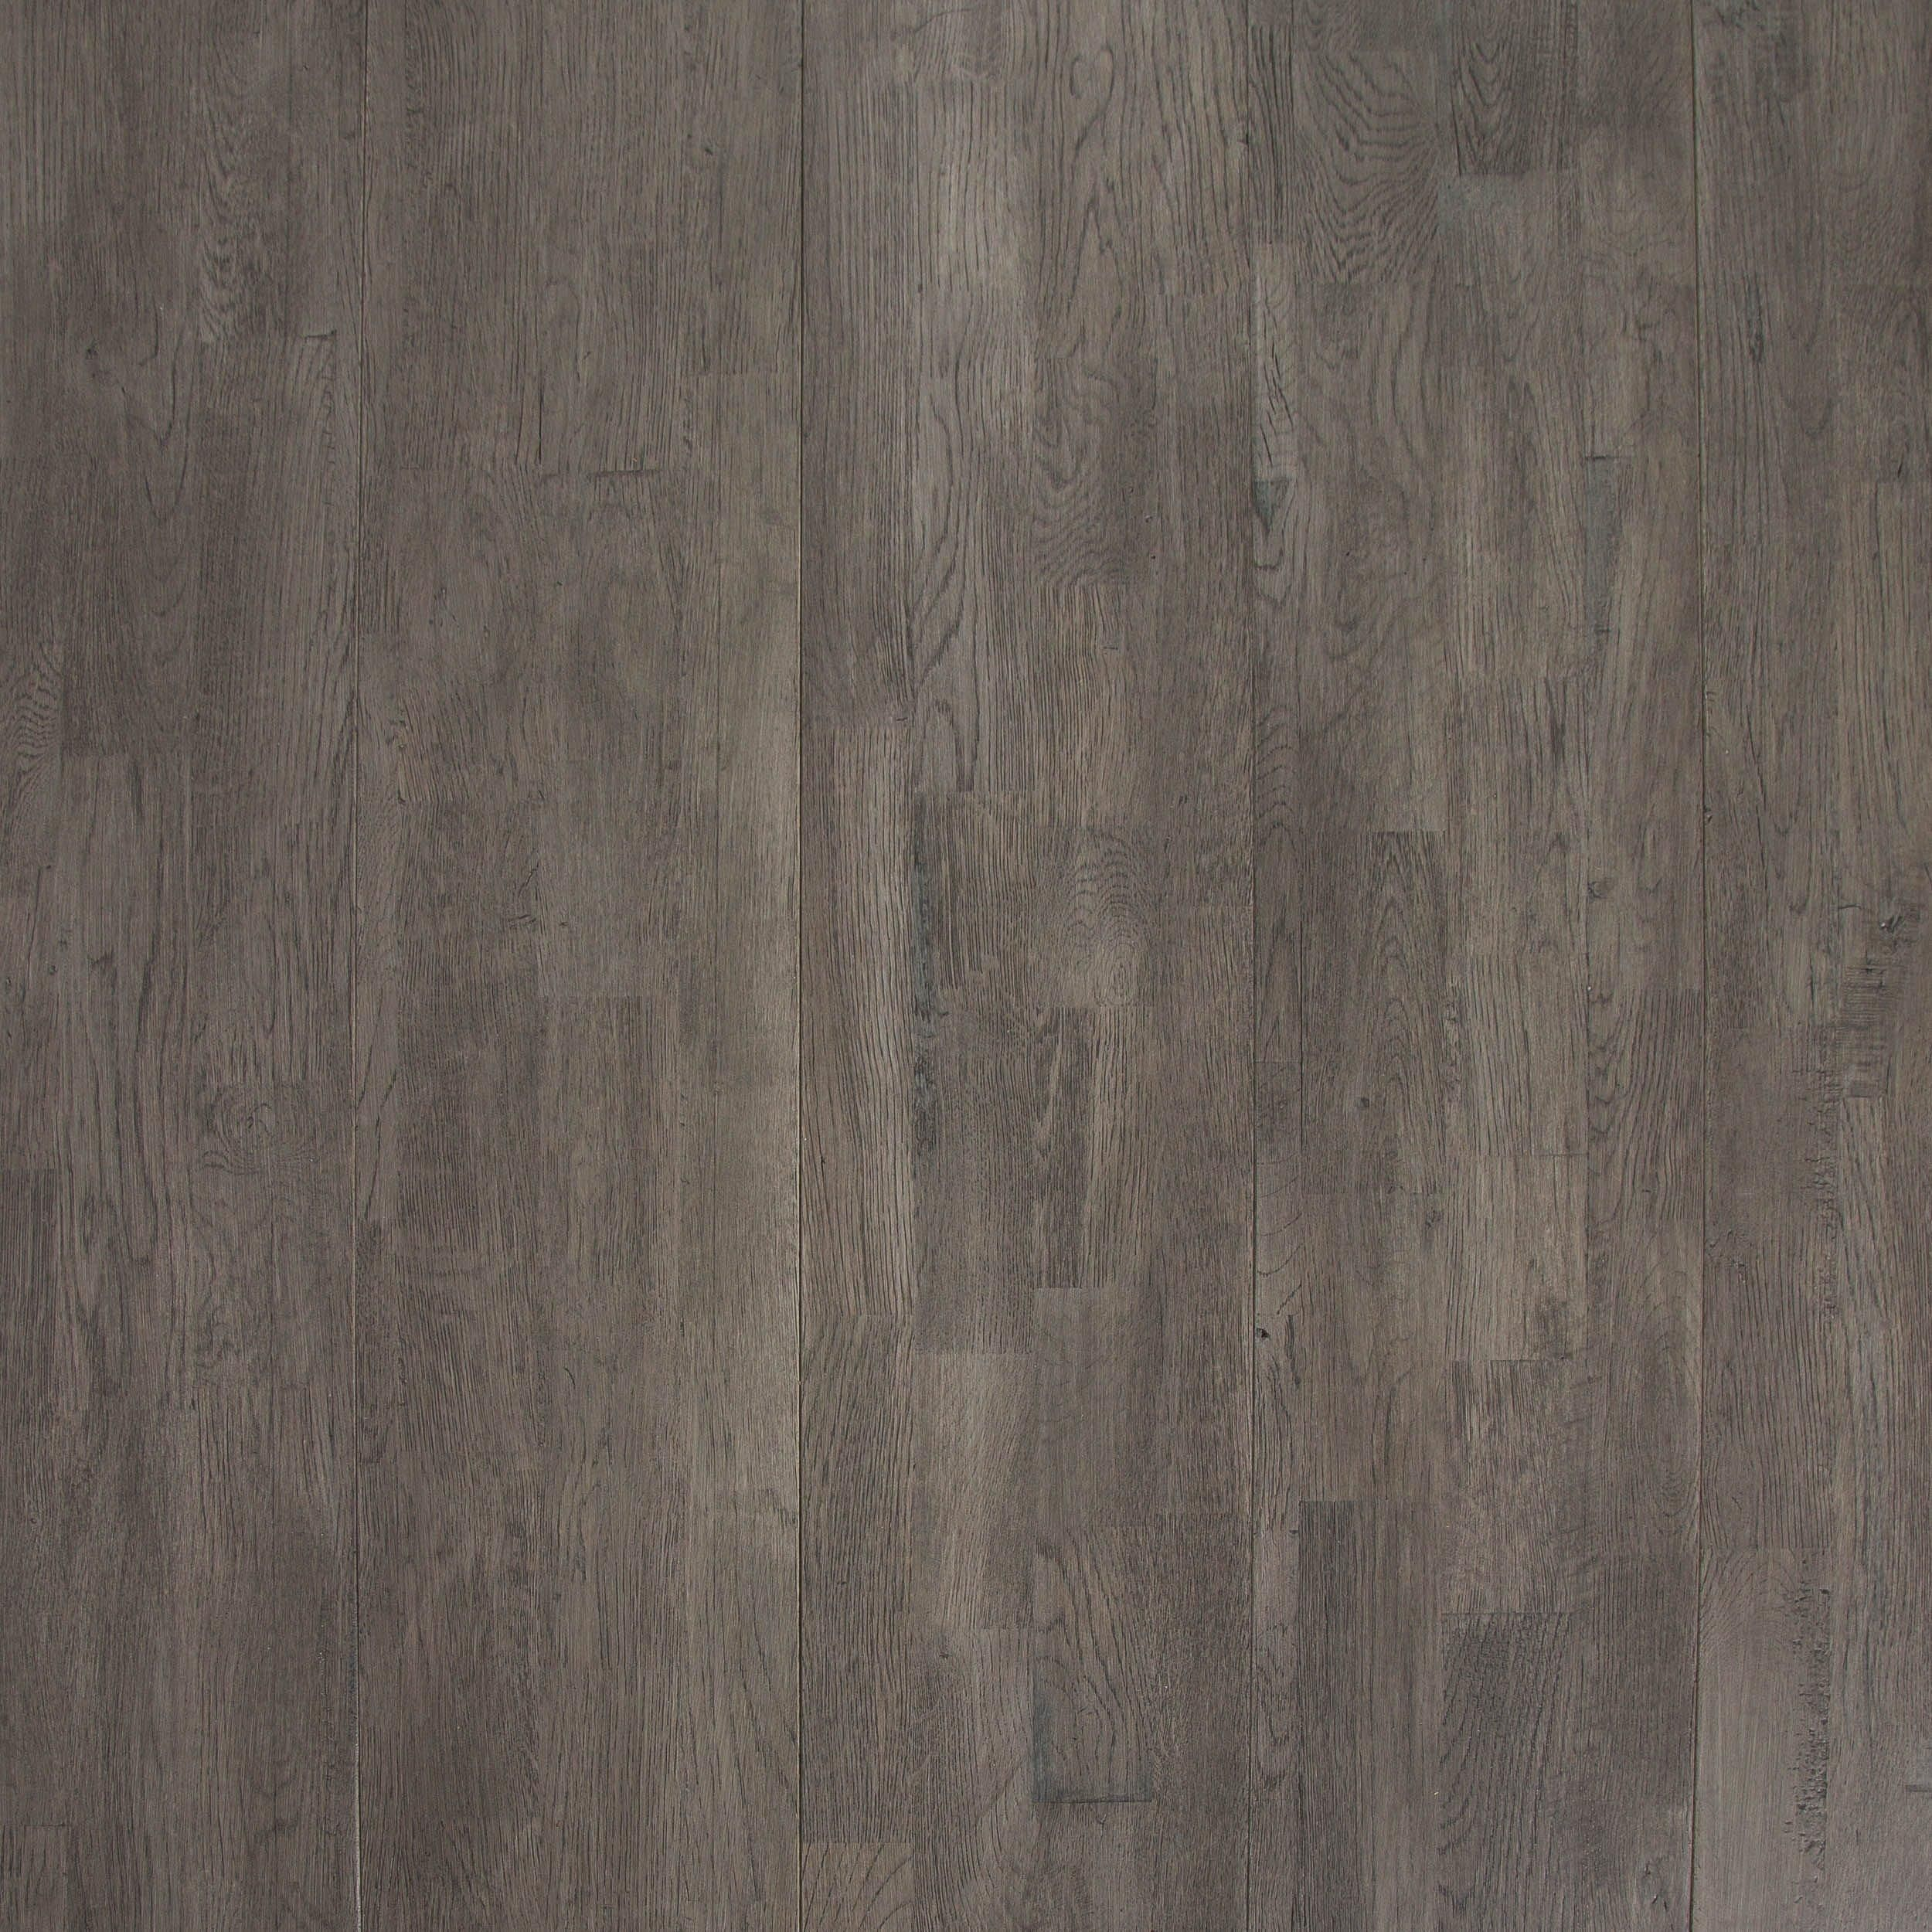 Light Gray Oak Wire Brushed Solid Hardwood In 2019 Vinyl